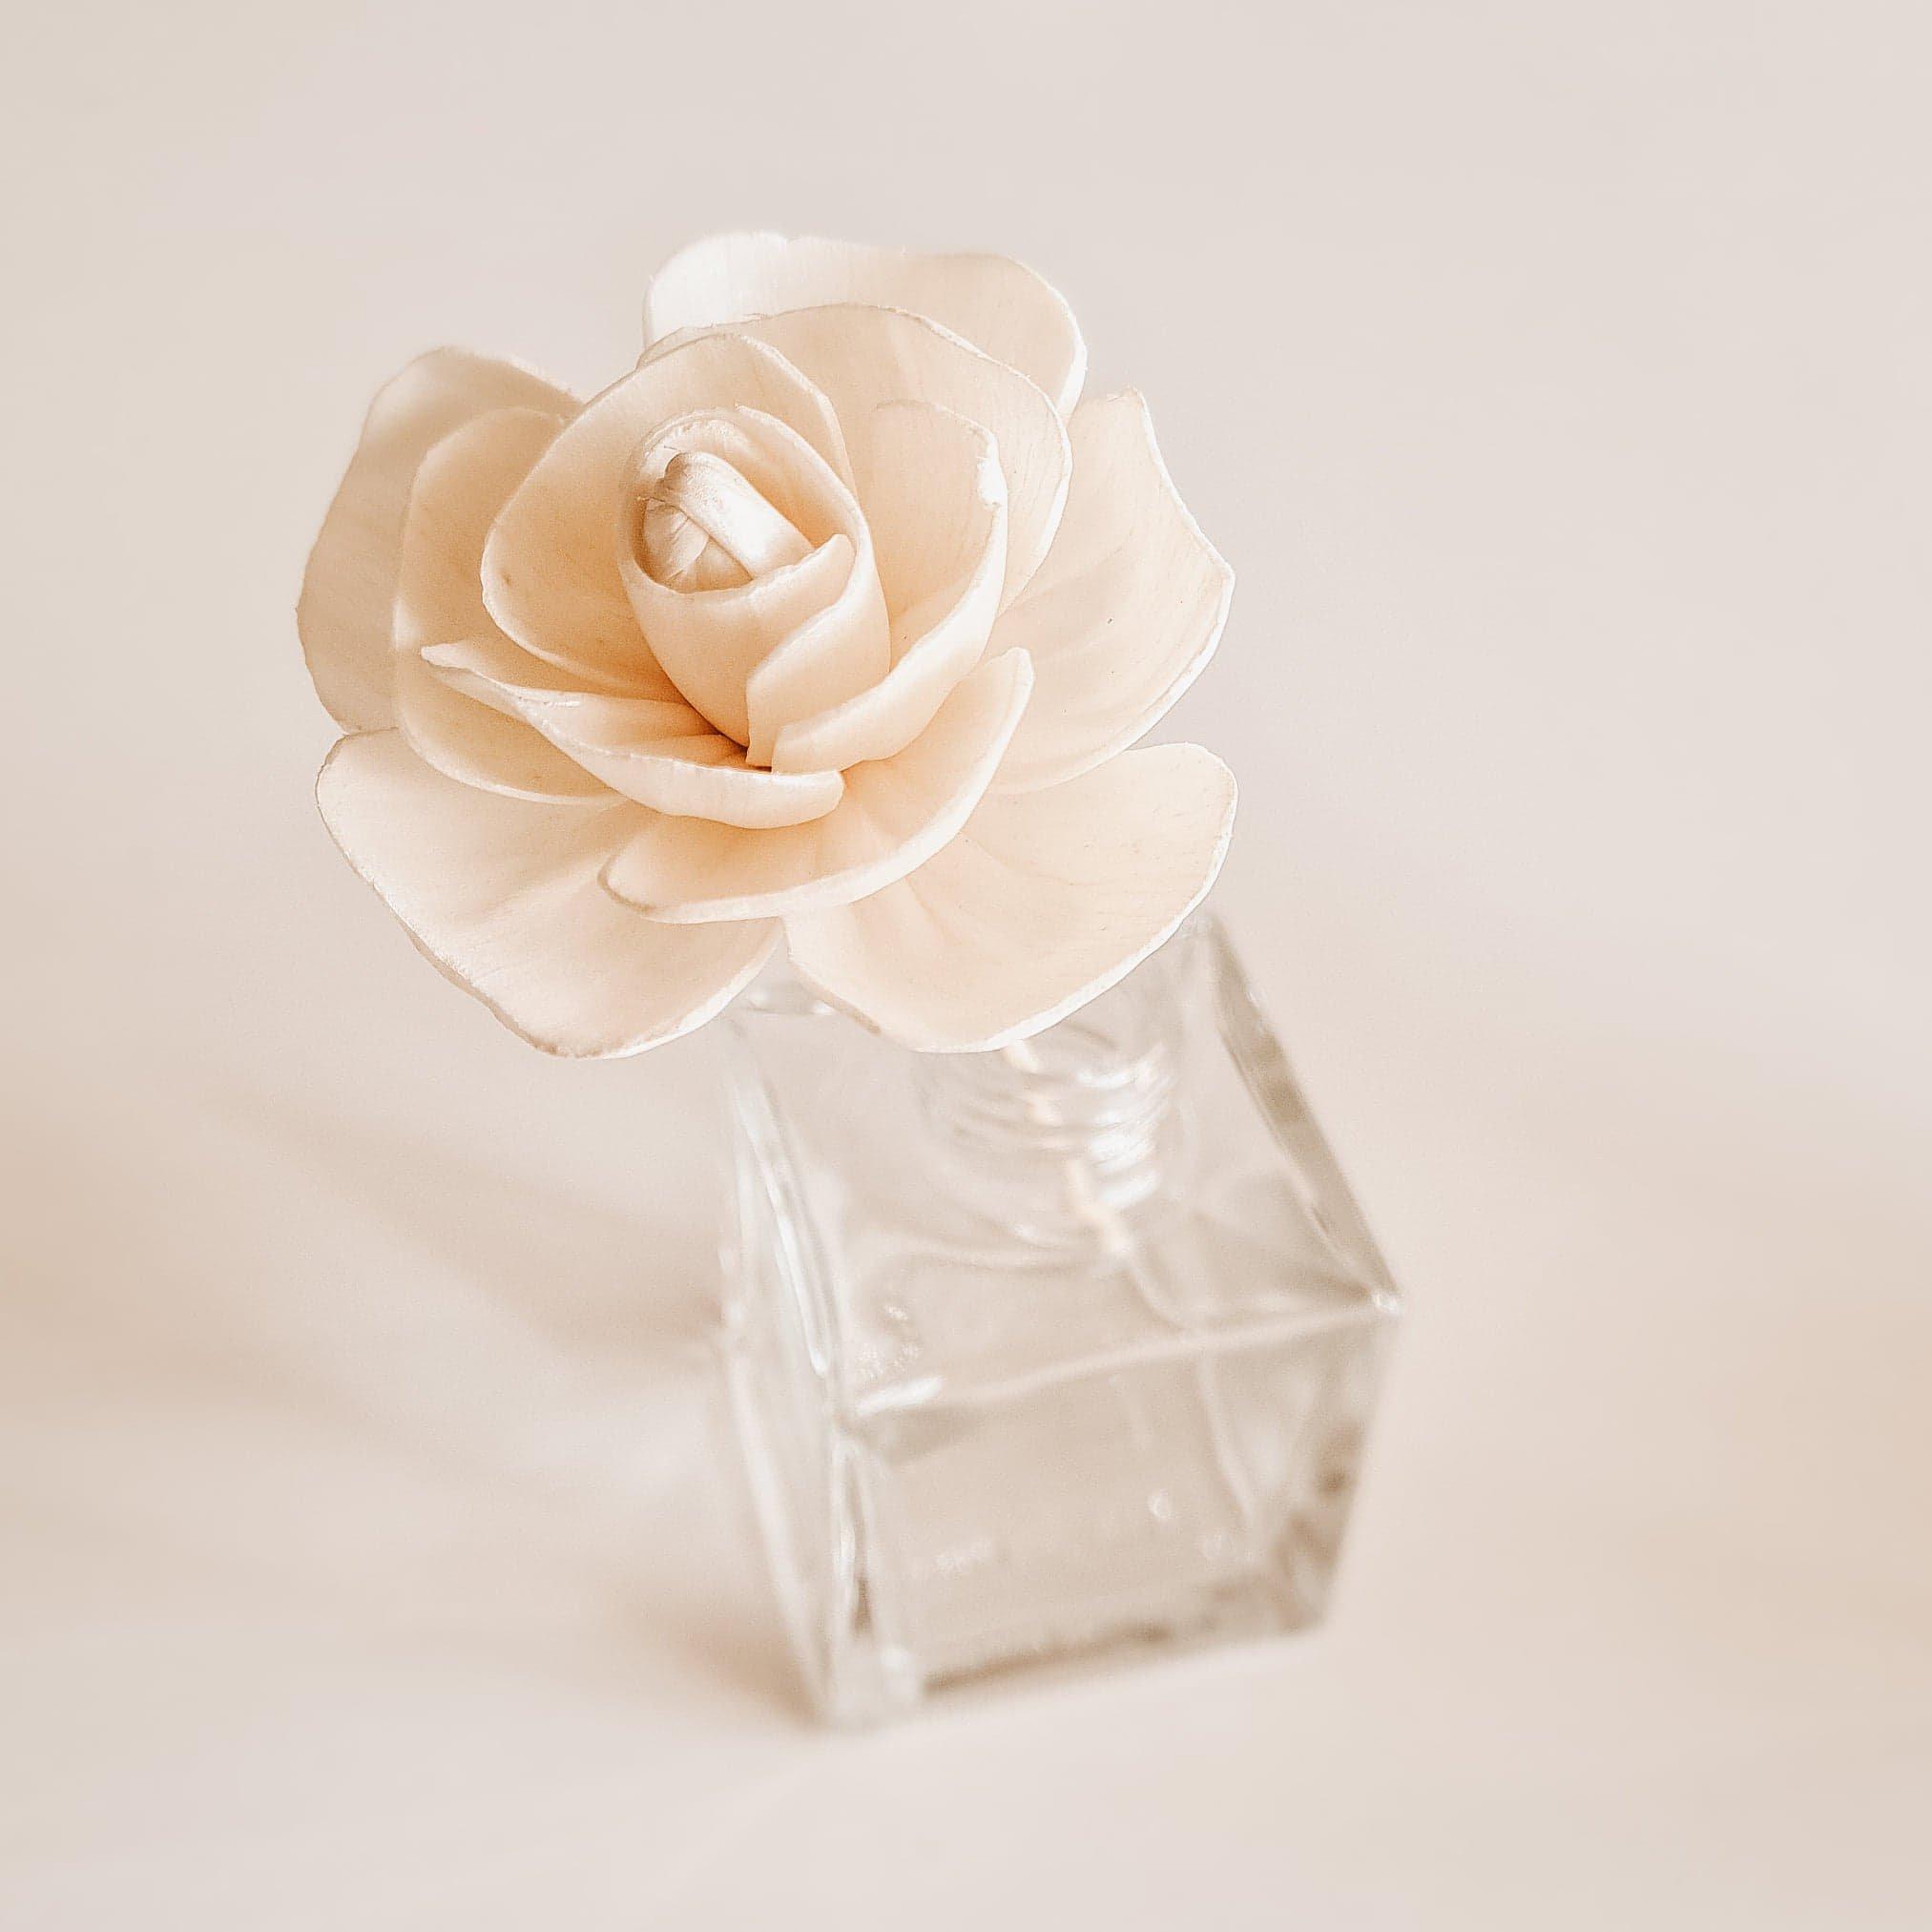 Rose Duftpind Reed Diffuser